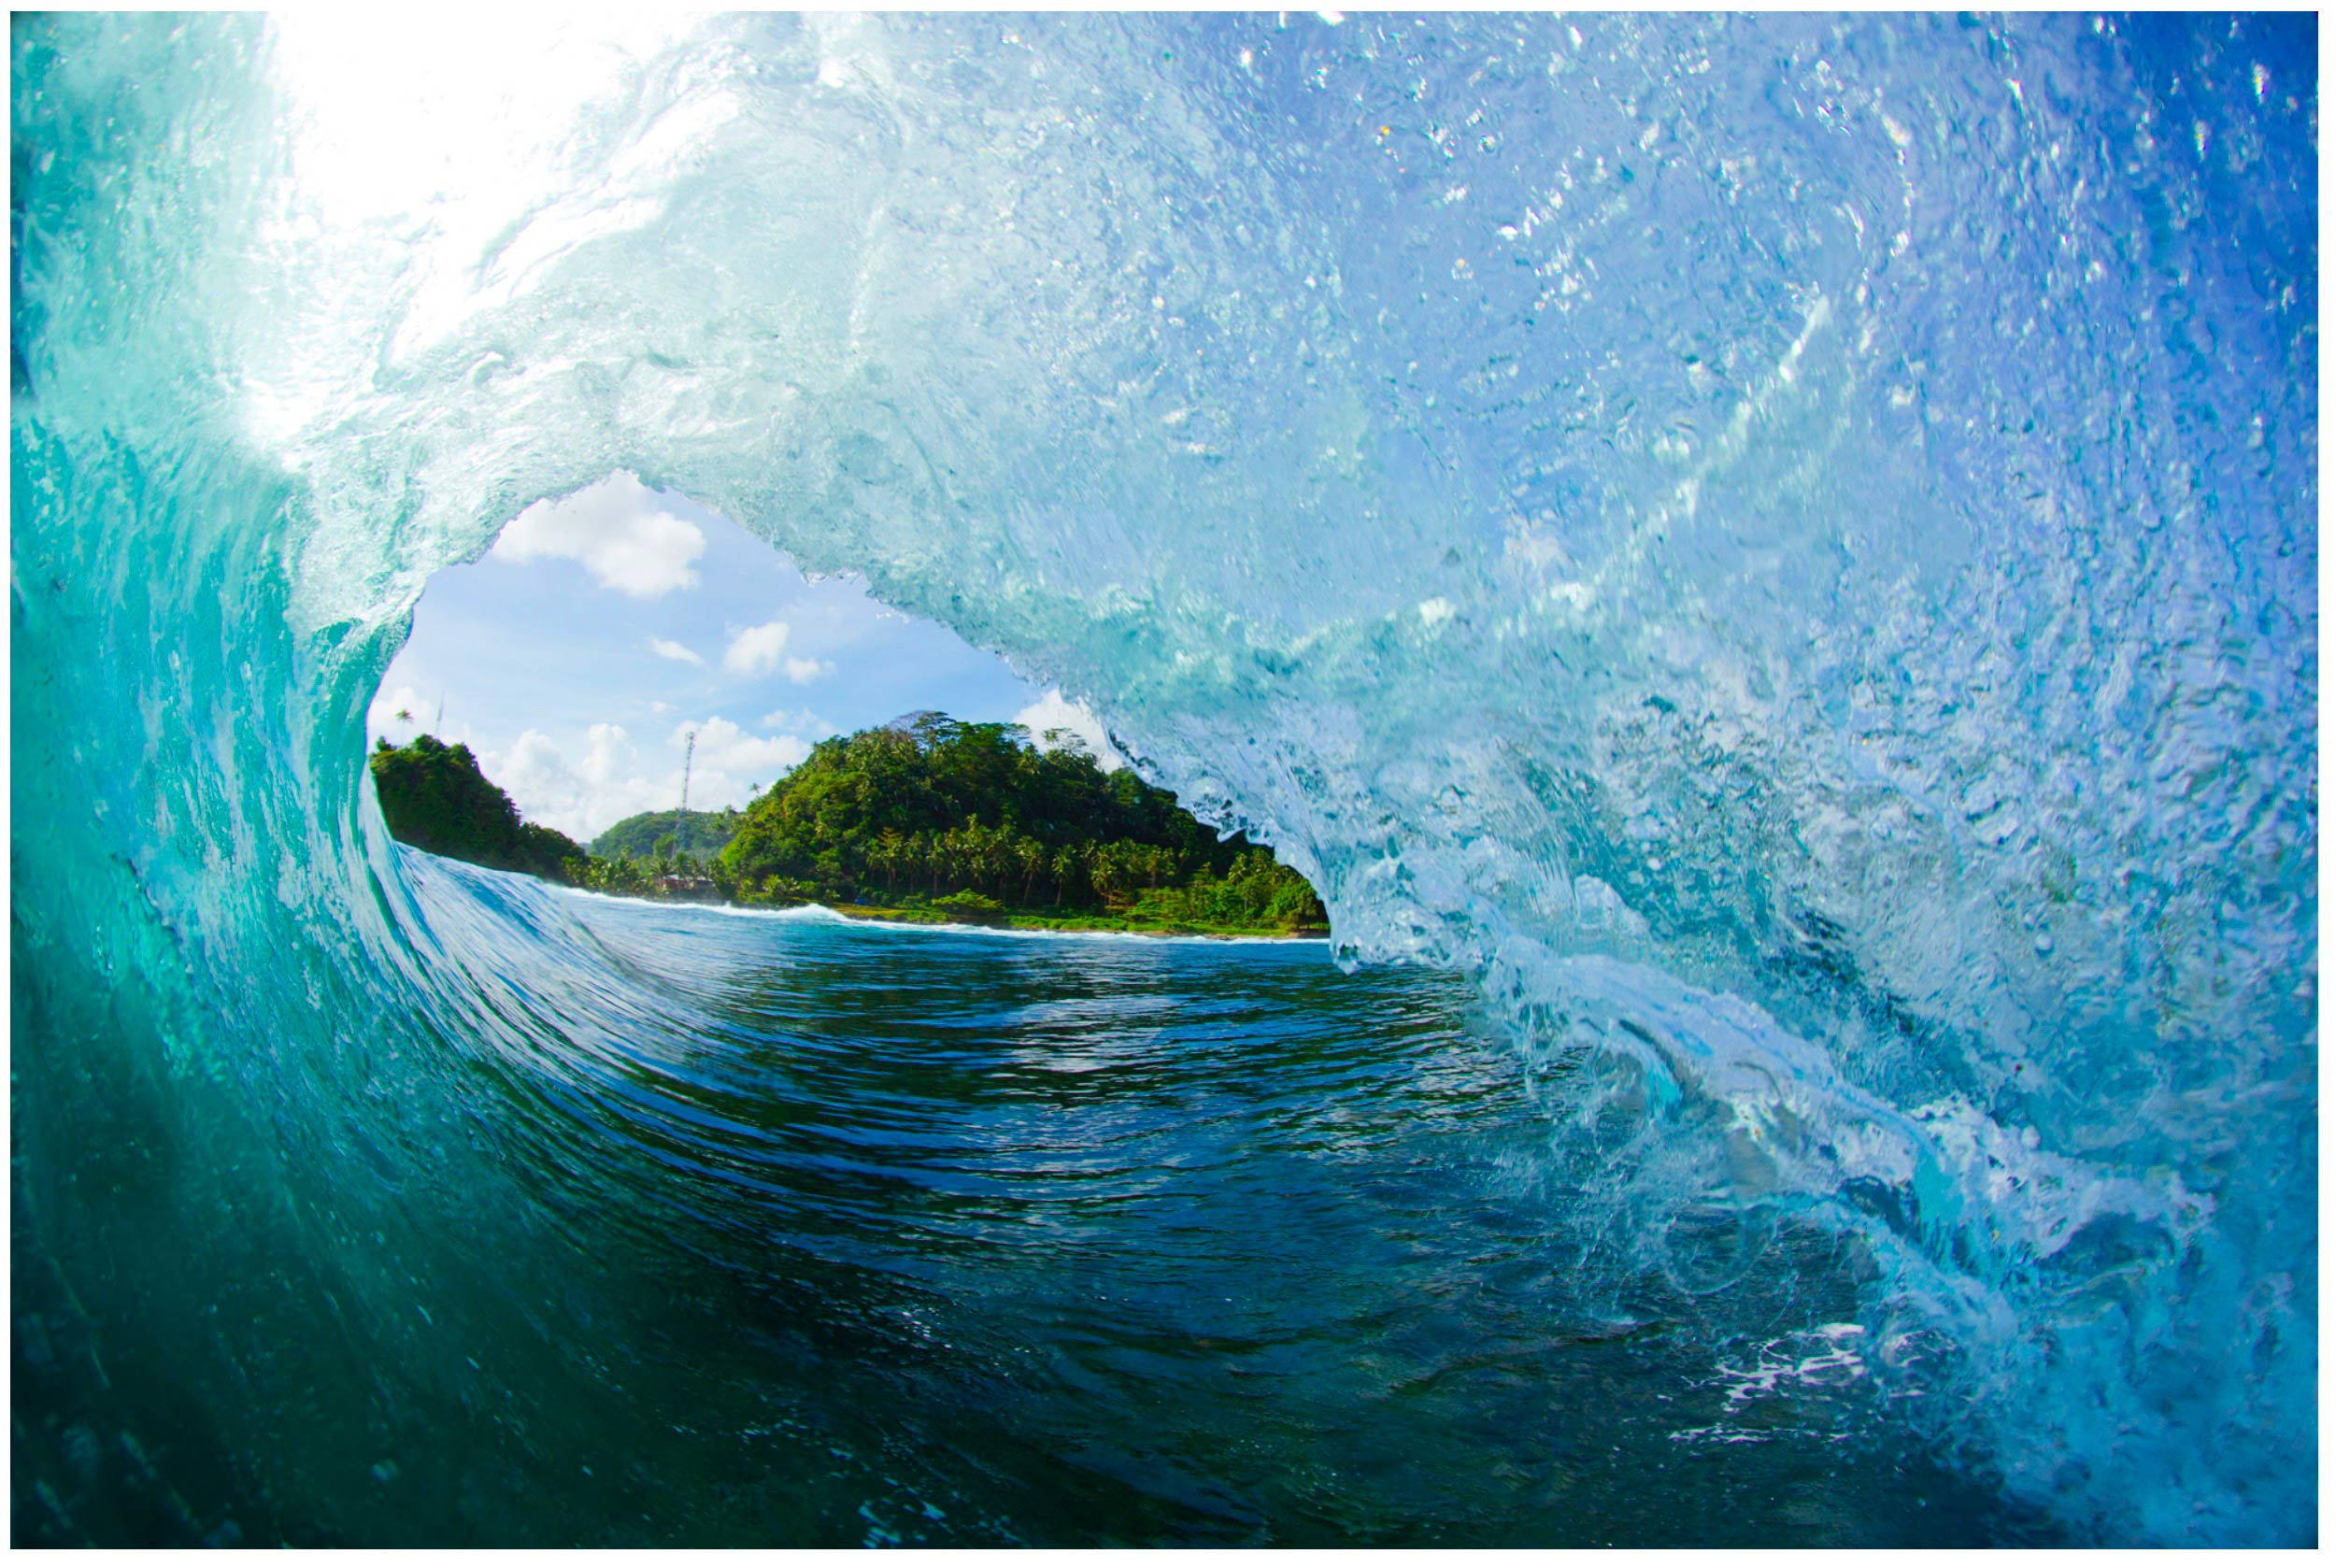 rodd-owen-ocean-surf-photography-for-sale-150.jpg